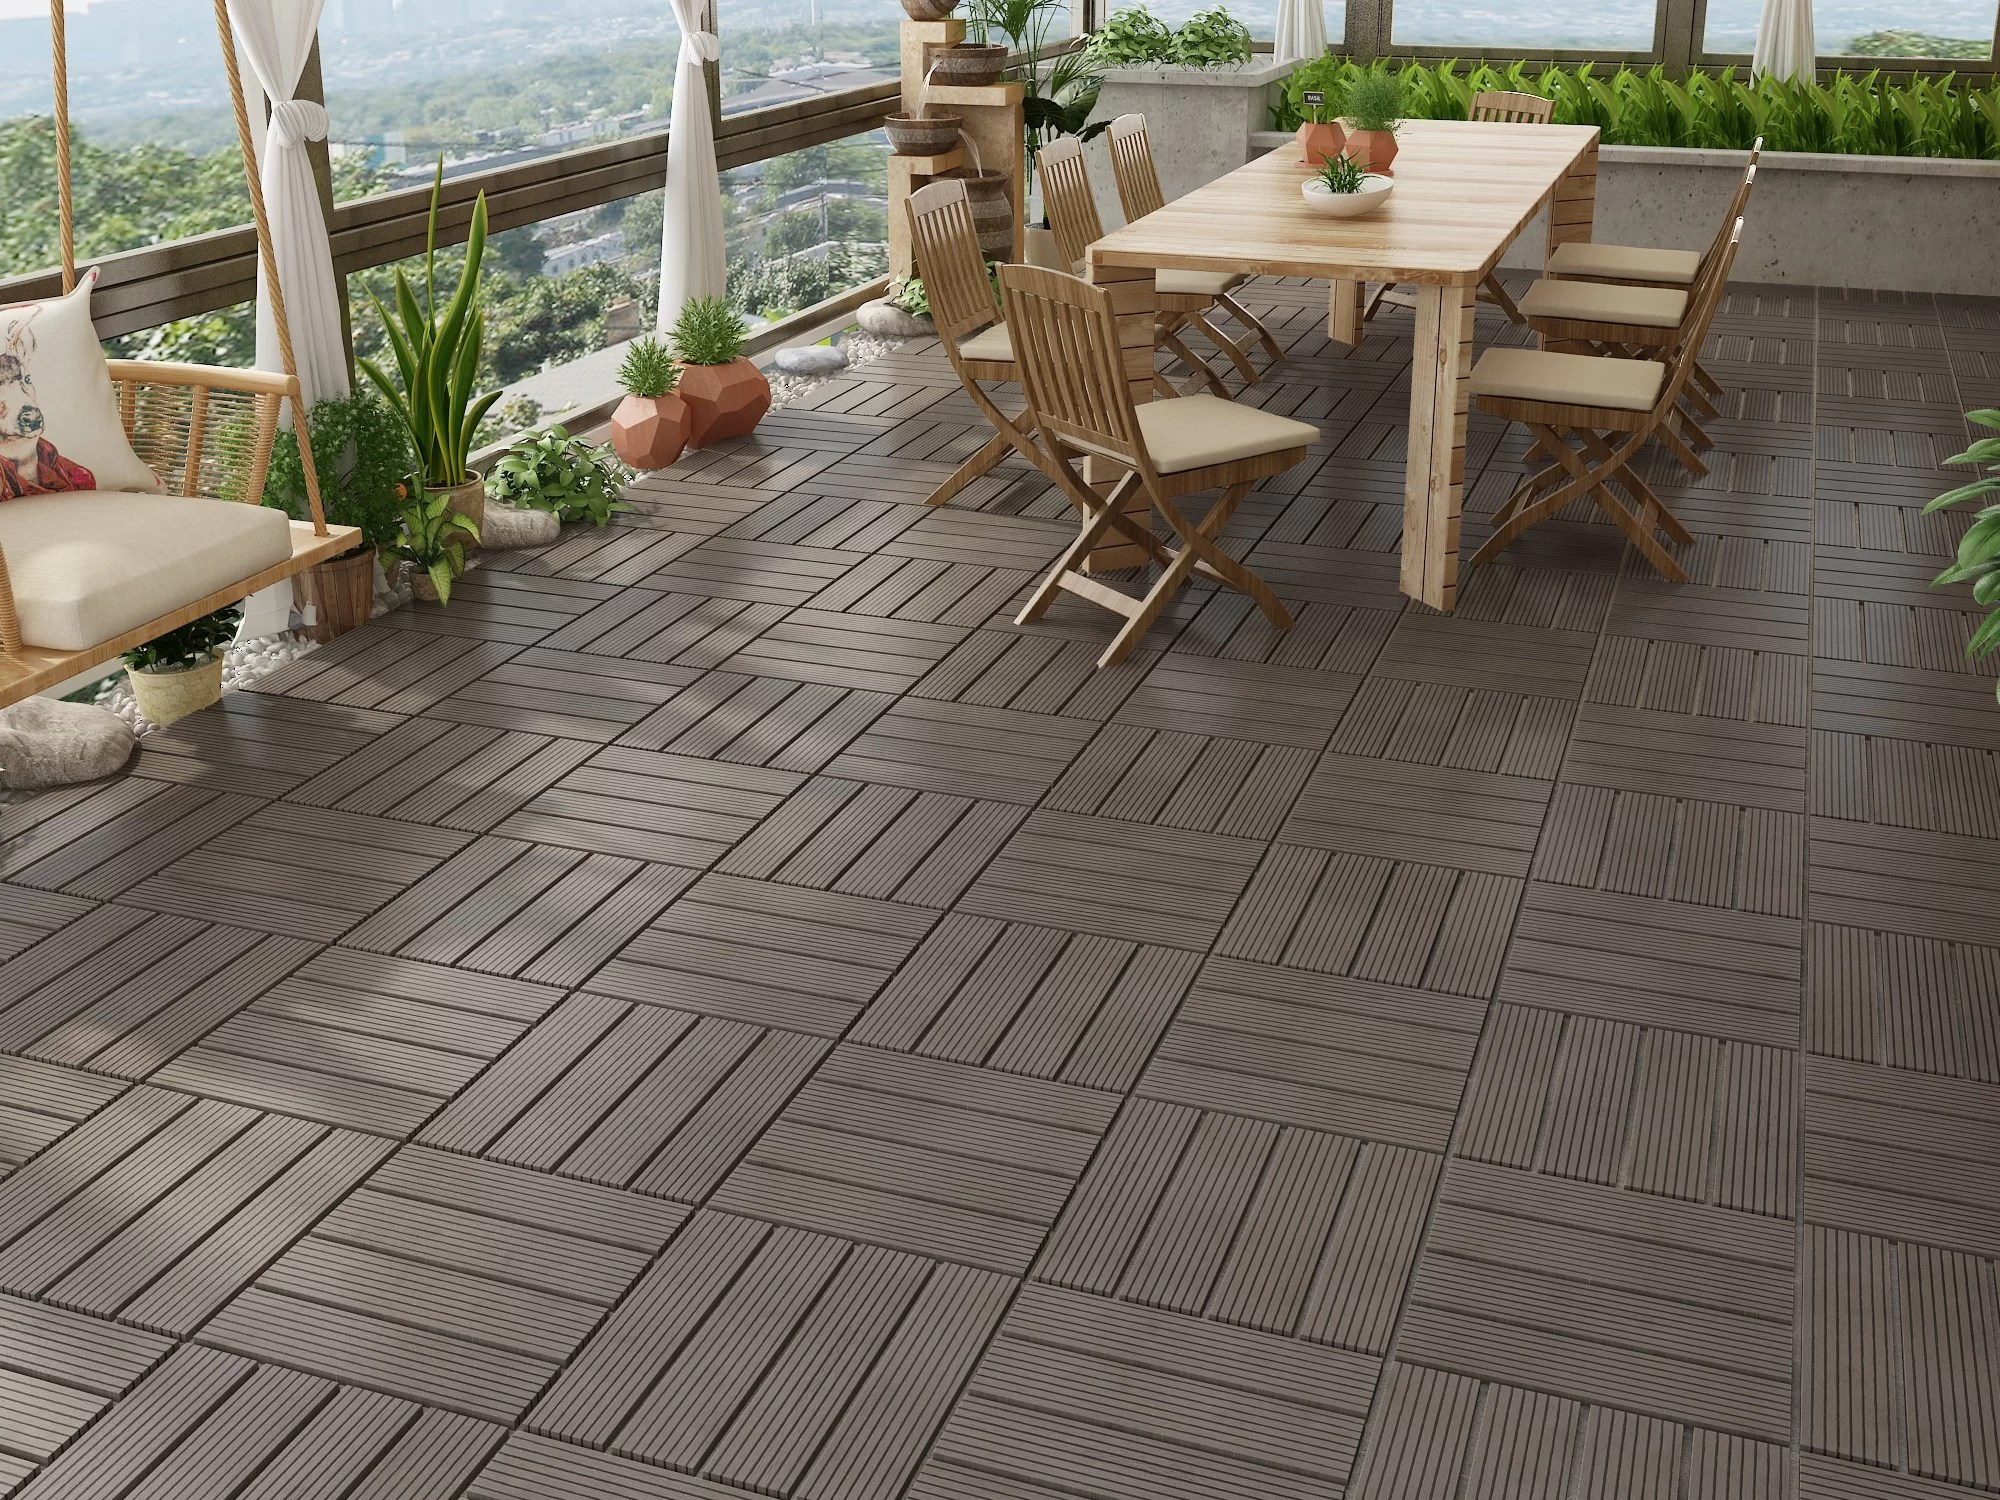 naturesort bamboo 12 x12 bamboo composite interlocking deck tile in dark wood